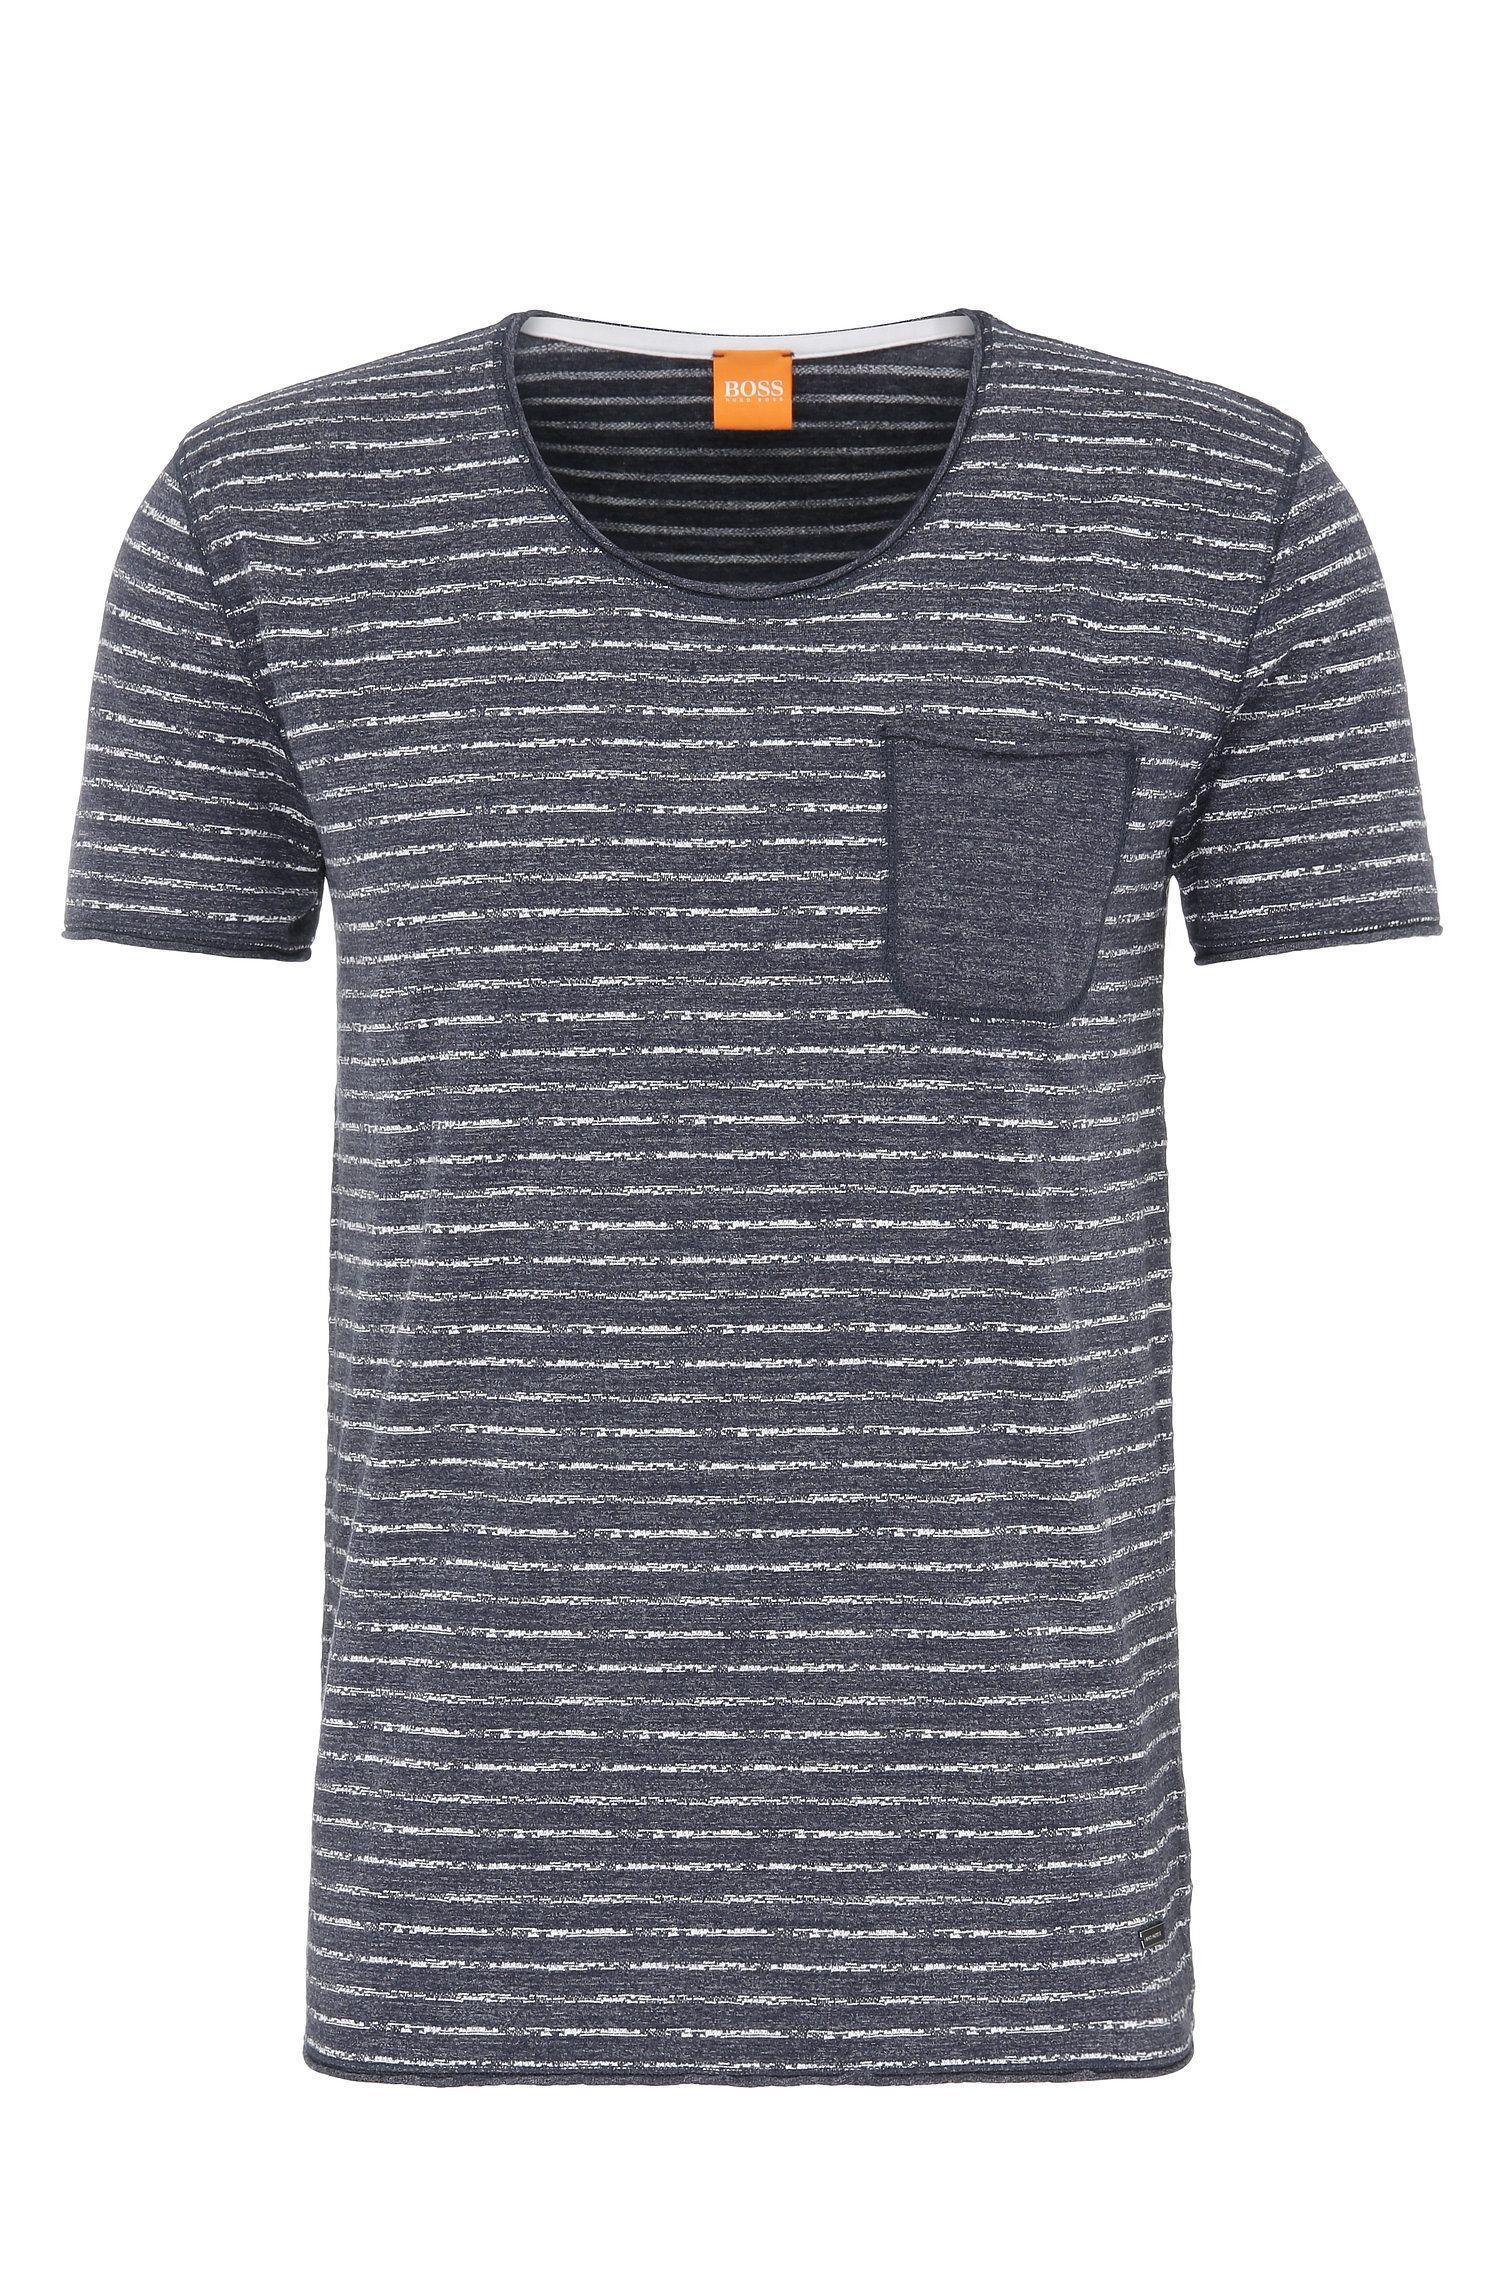 Cotton Stripe Pocket T-Shirt | Toa